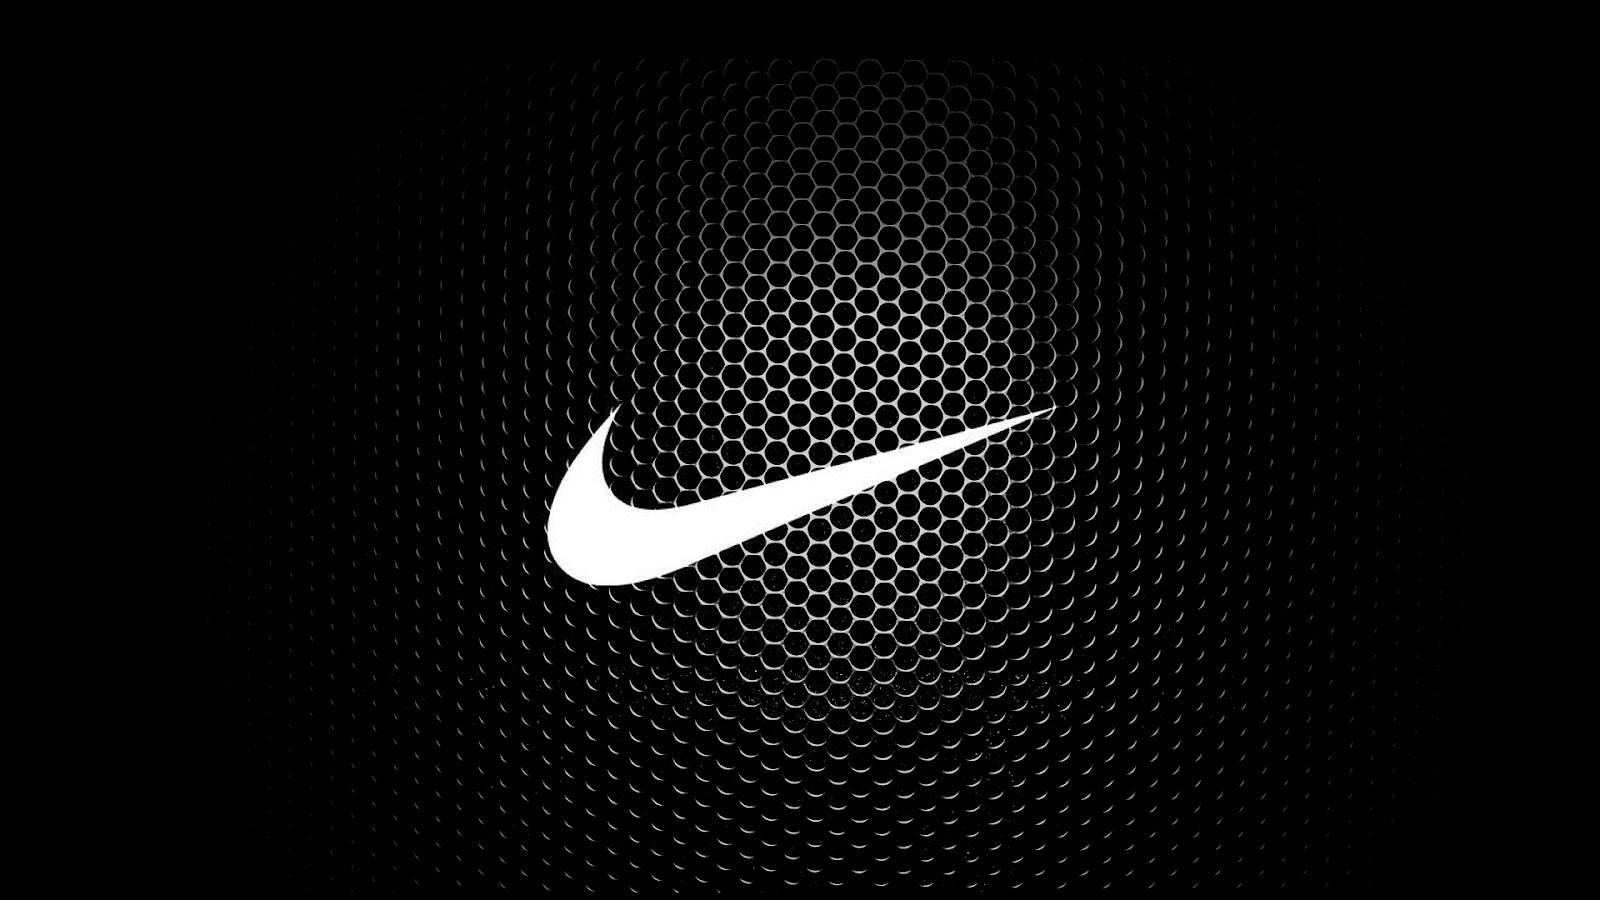 25 Impressive Nike Wallpapers For Desktop 1600x900